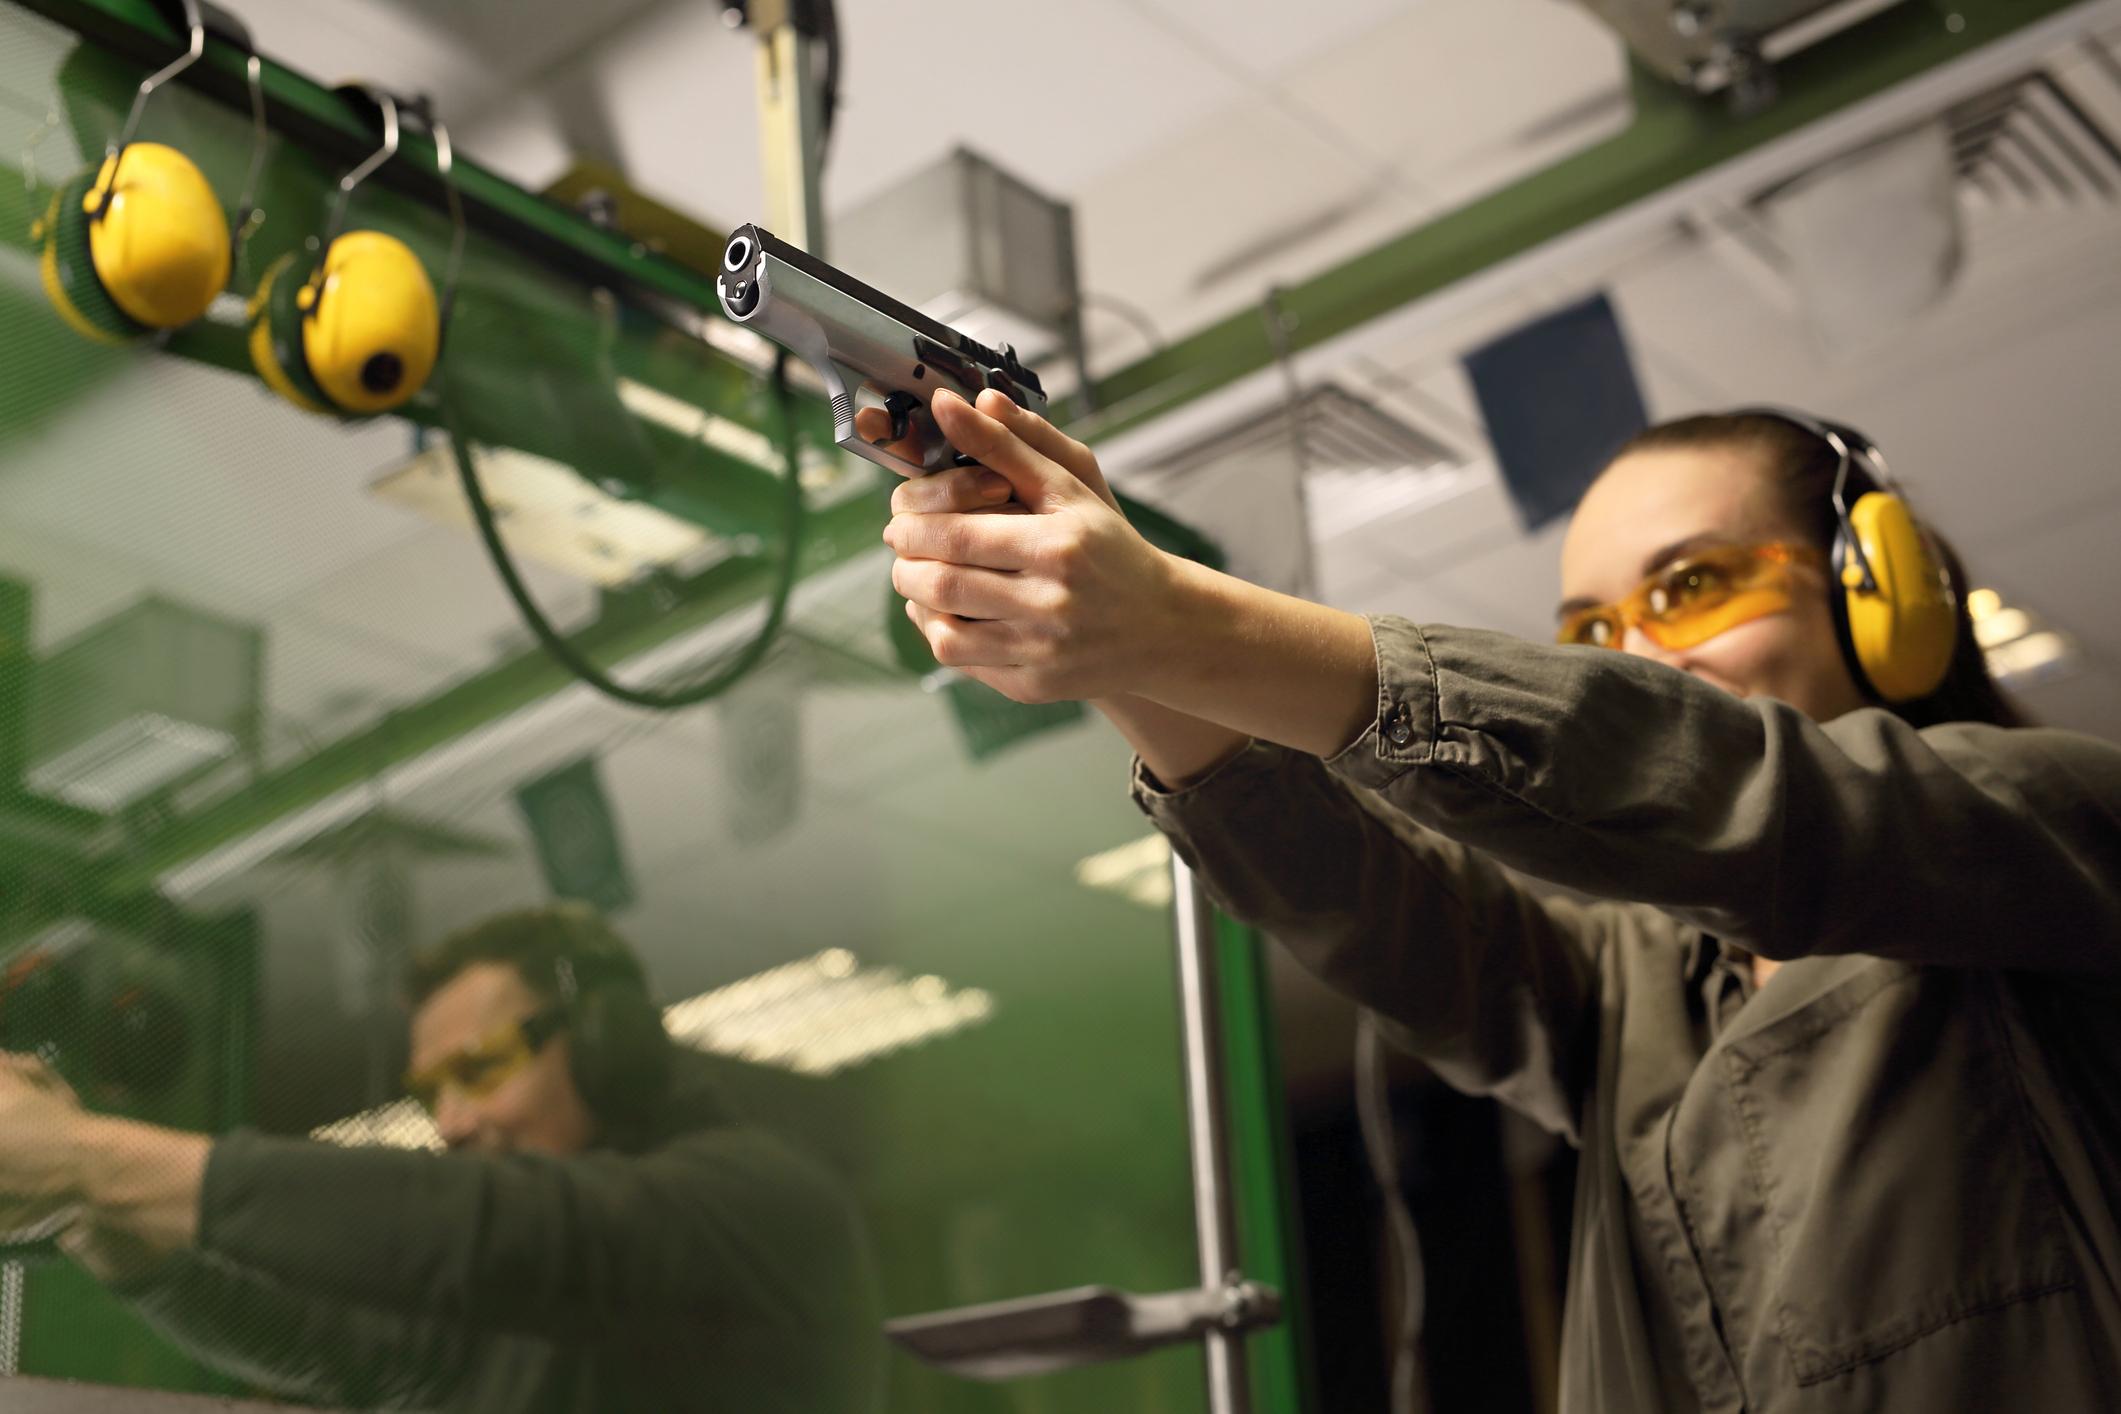 Woman shooting a handgun at a range